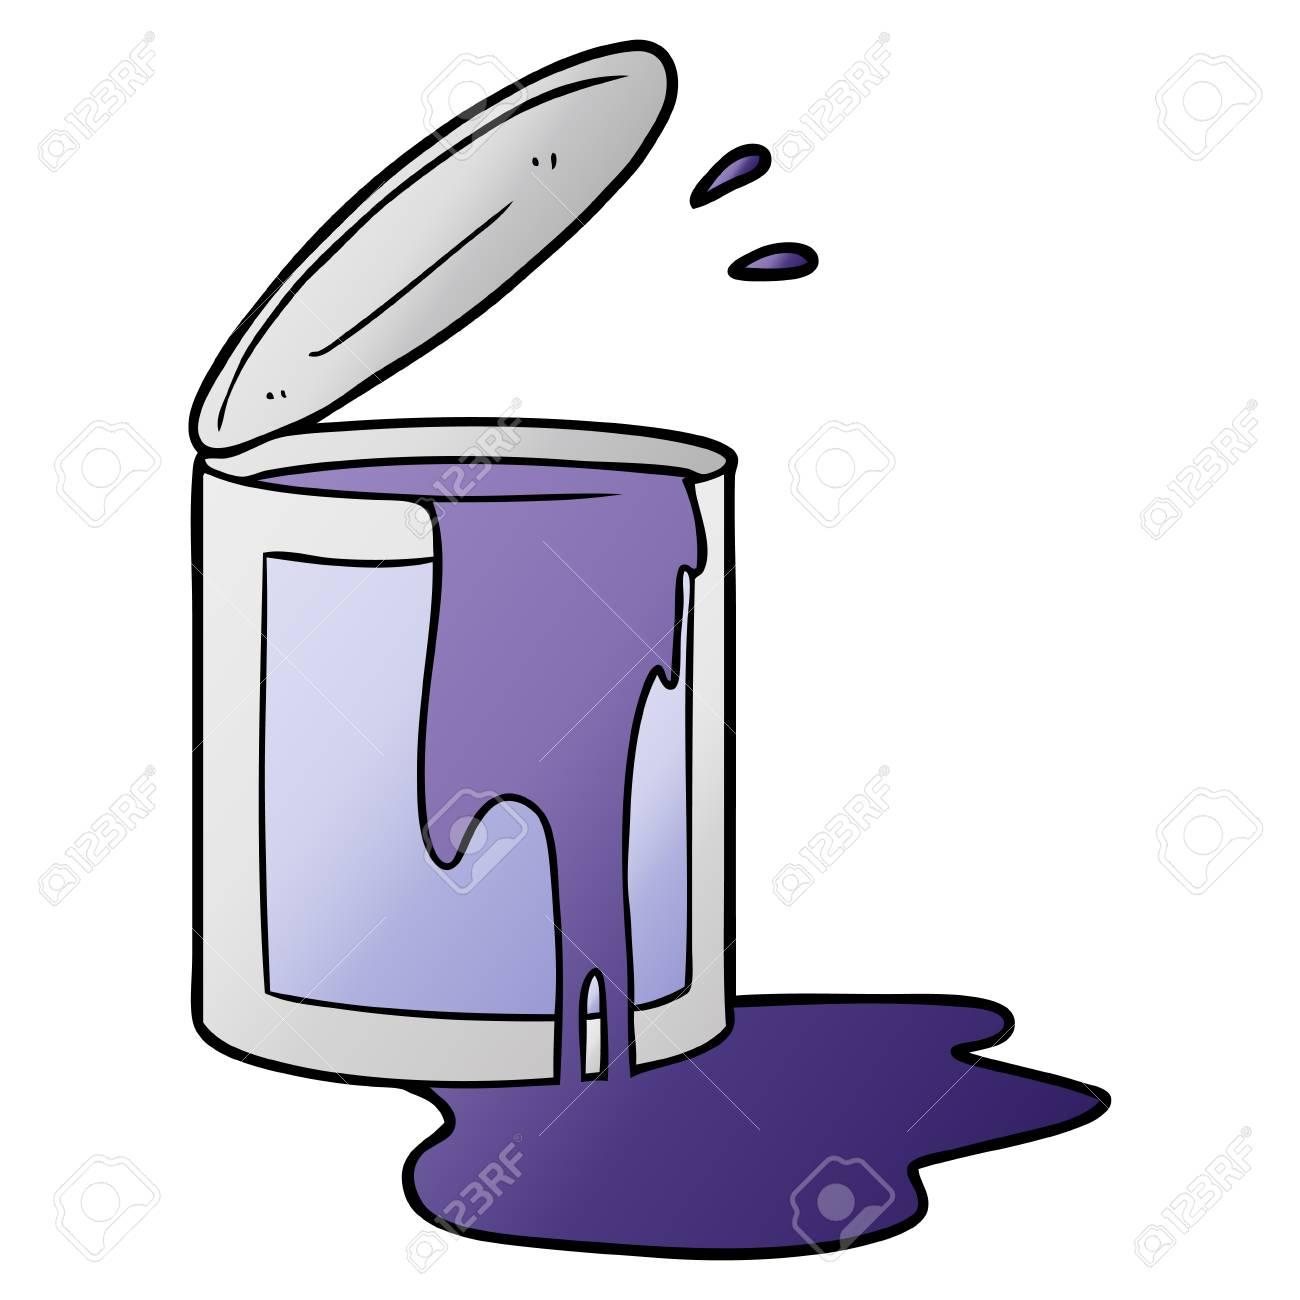 Cartoon Paint Bucket Royalty Free Cliparts Vectors And Stock Illustration Image 94742859